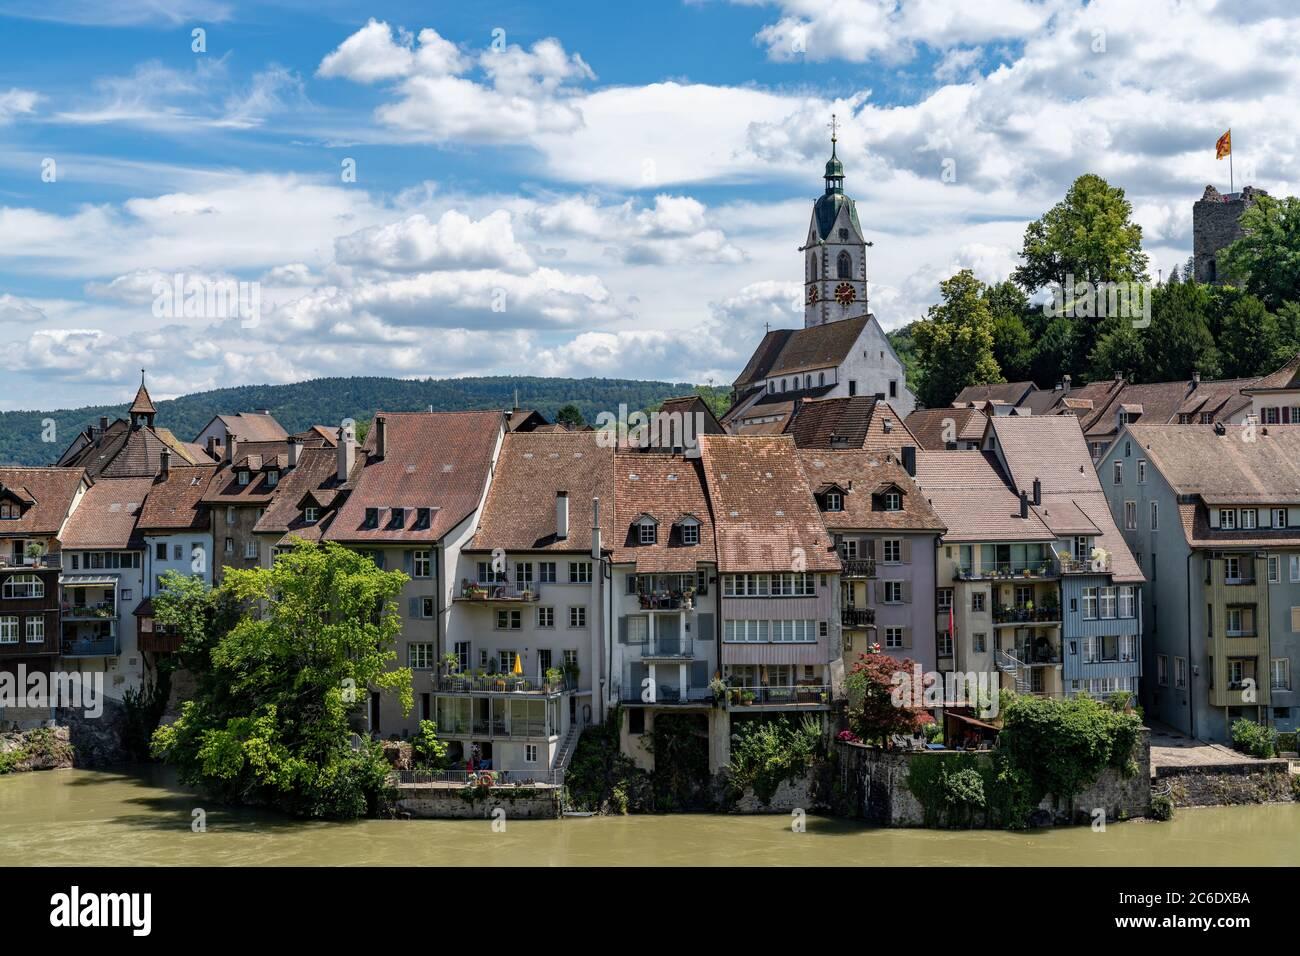 Laufenburg, AG / Switzerland - 4 July 2020: view of the idyllic border town of Laufenburg on the Rhine in northern Switzerland Stock Photo